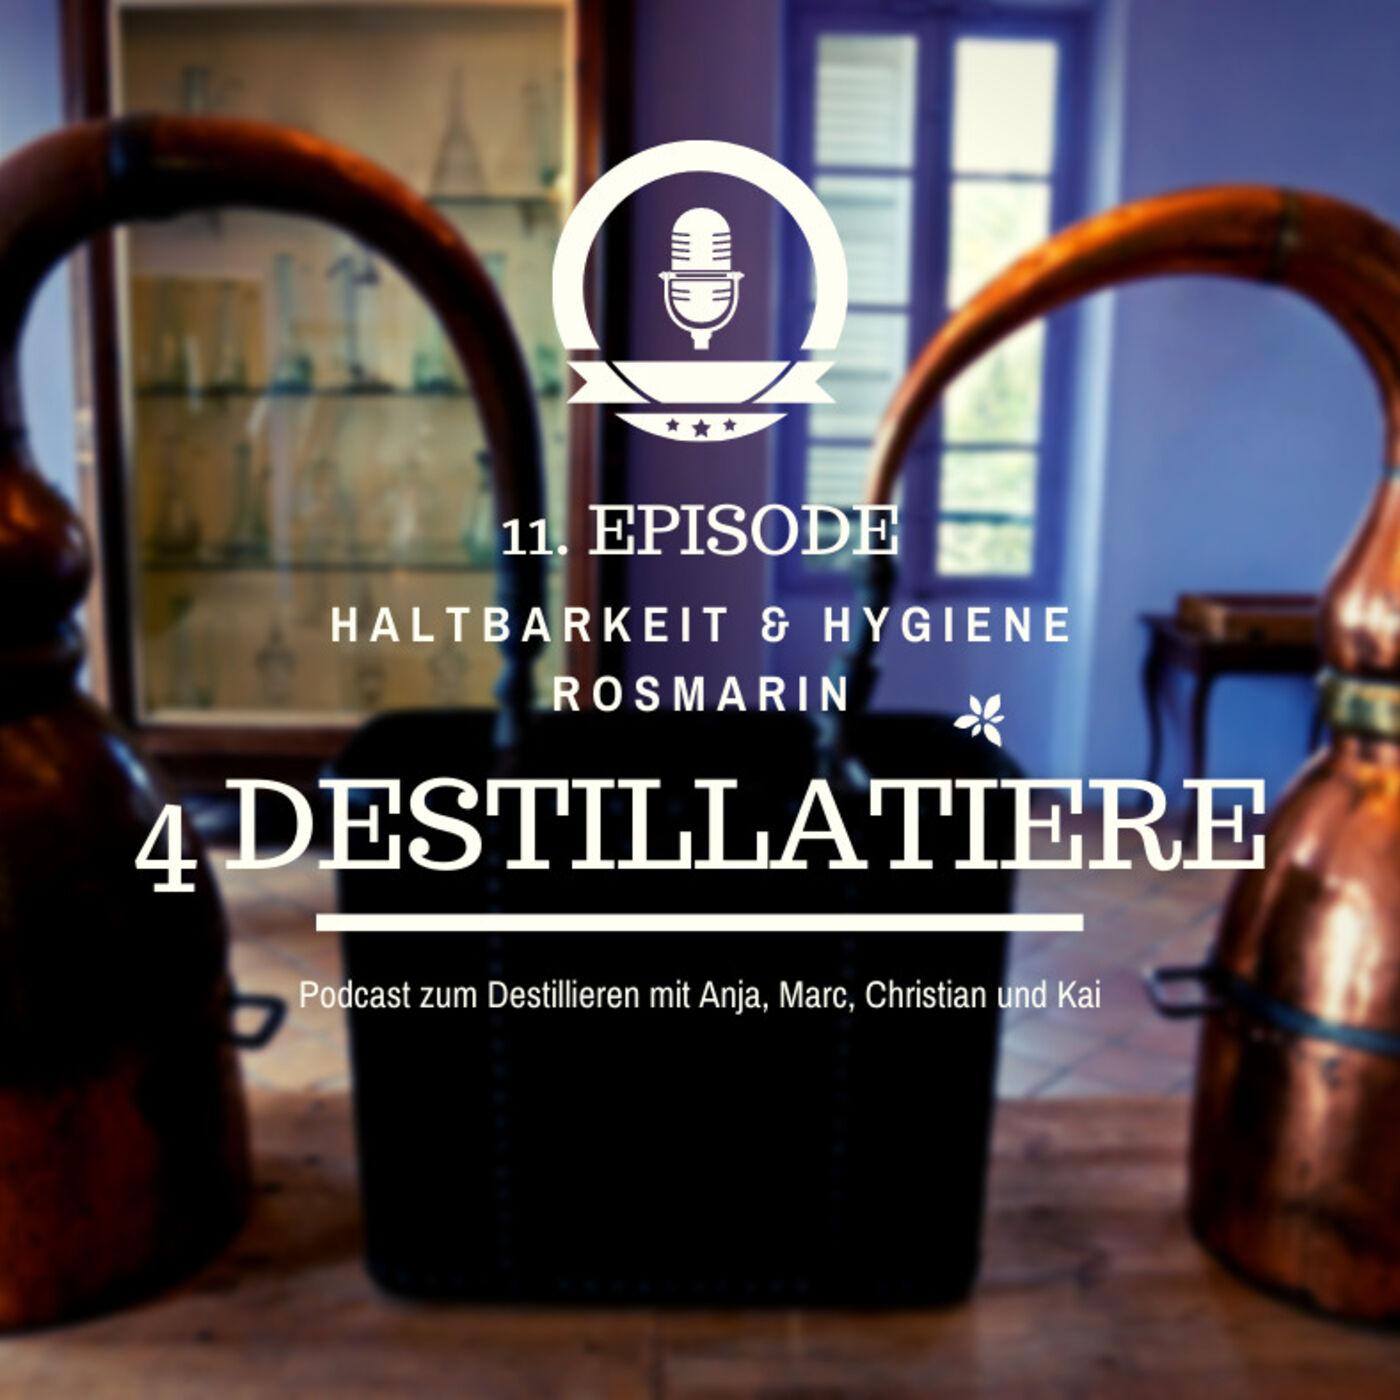 4D 011: Haltbarkeit, Hygiene + Rosmarin